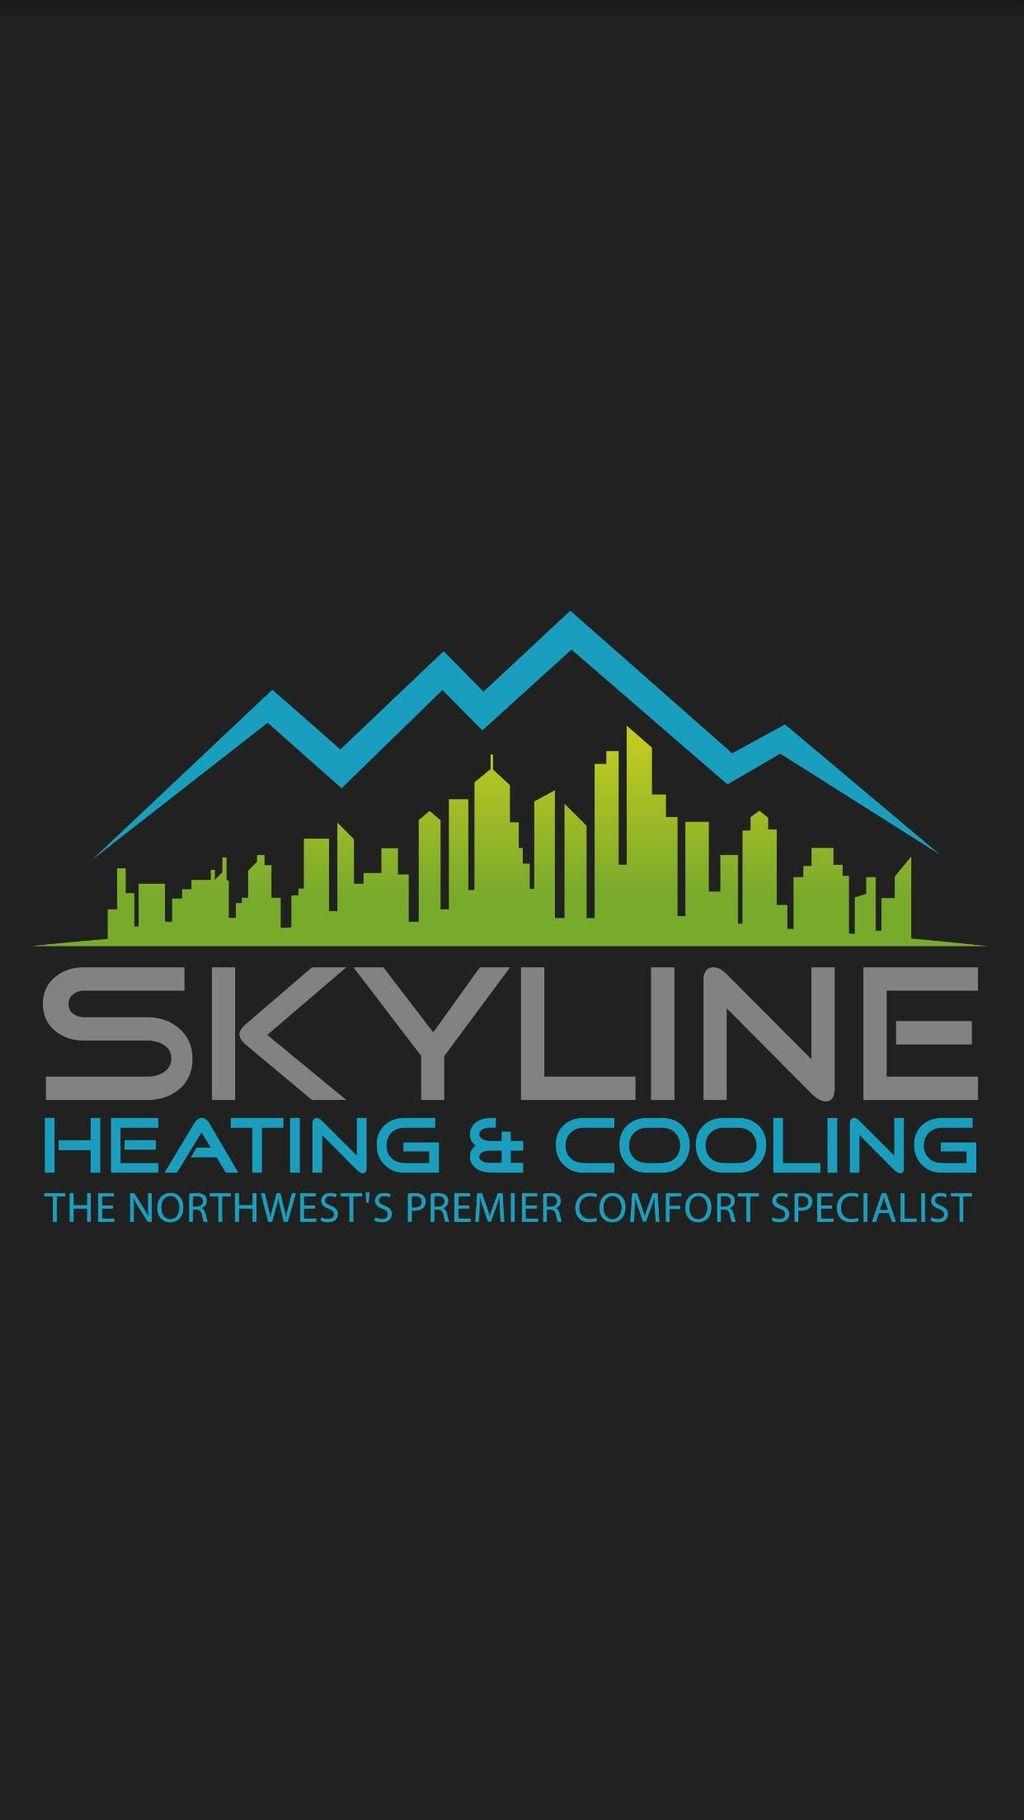 Skyline Heating & Cooling LLC